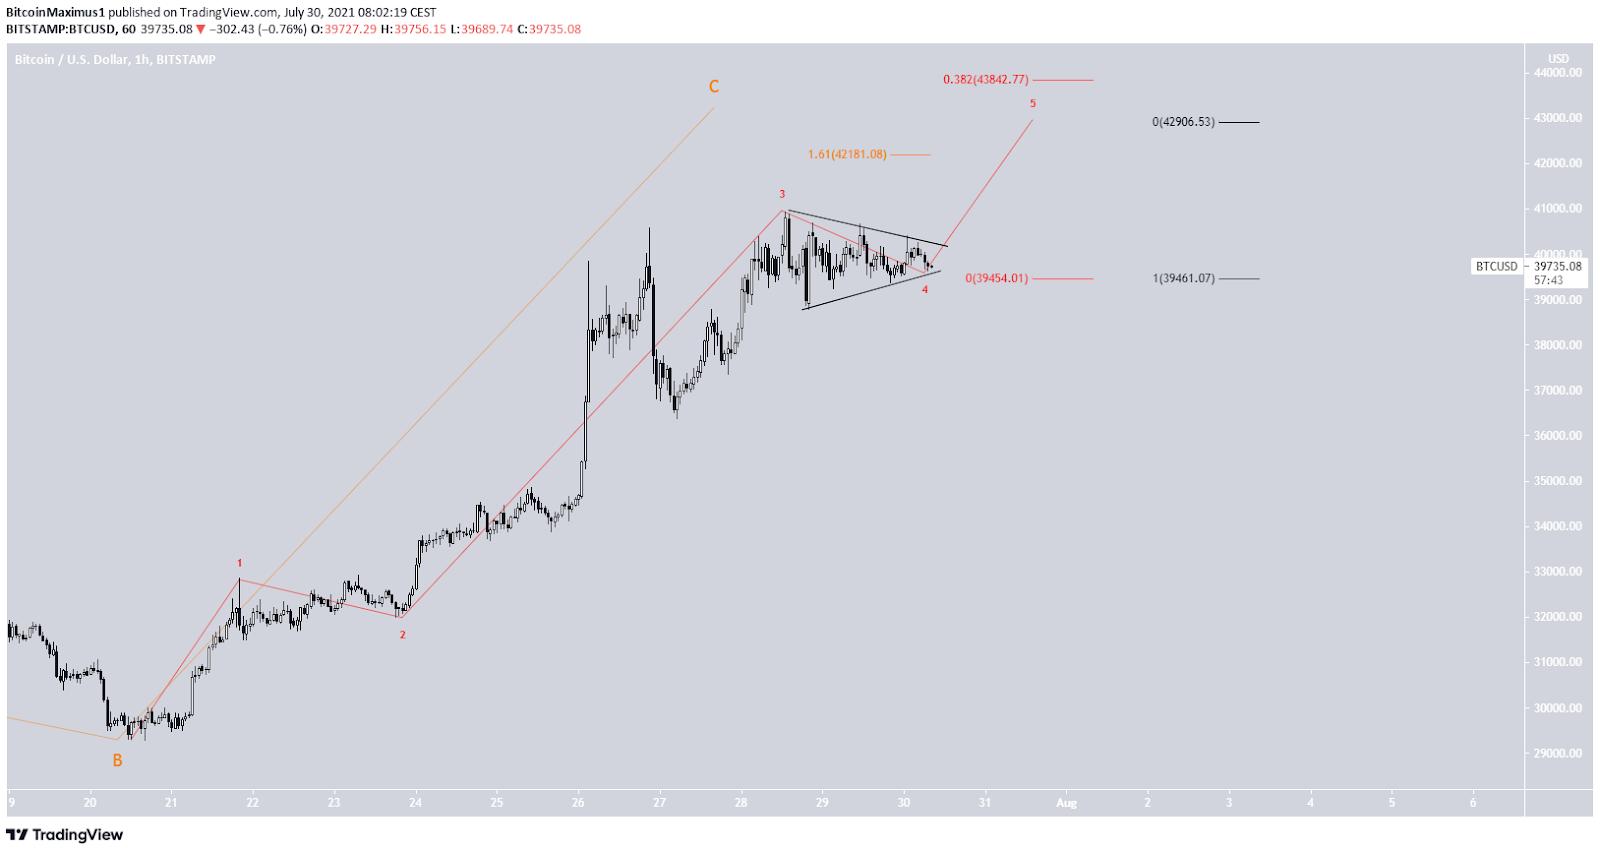 Bitcoin Preis Kurs BTC Wellenanalyse 2 30.07.2021